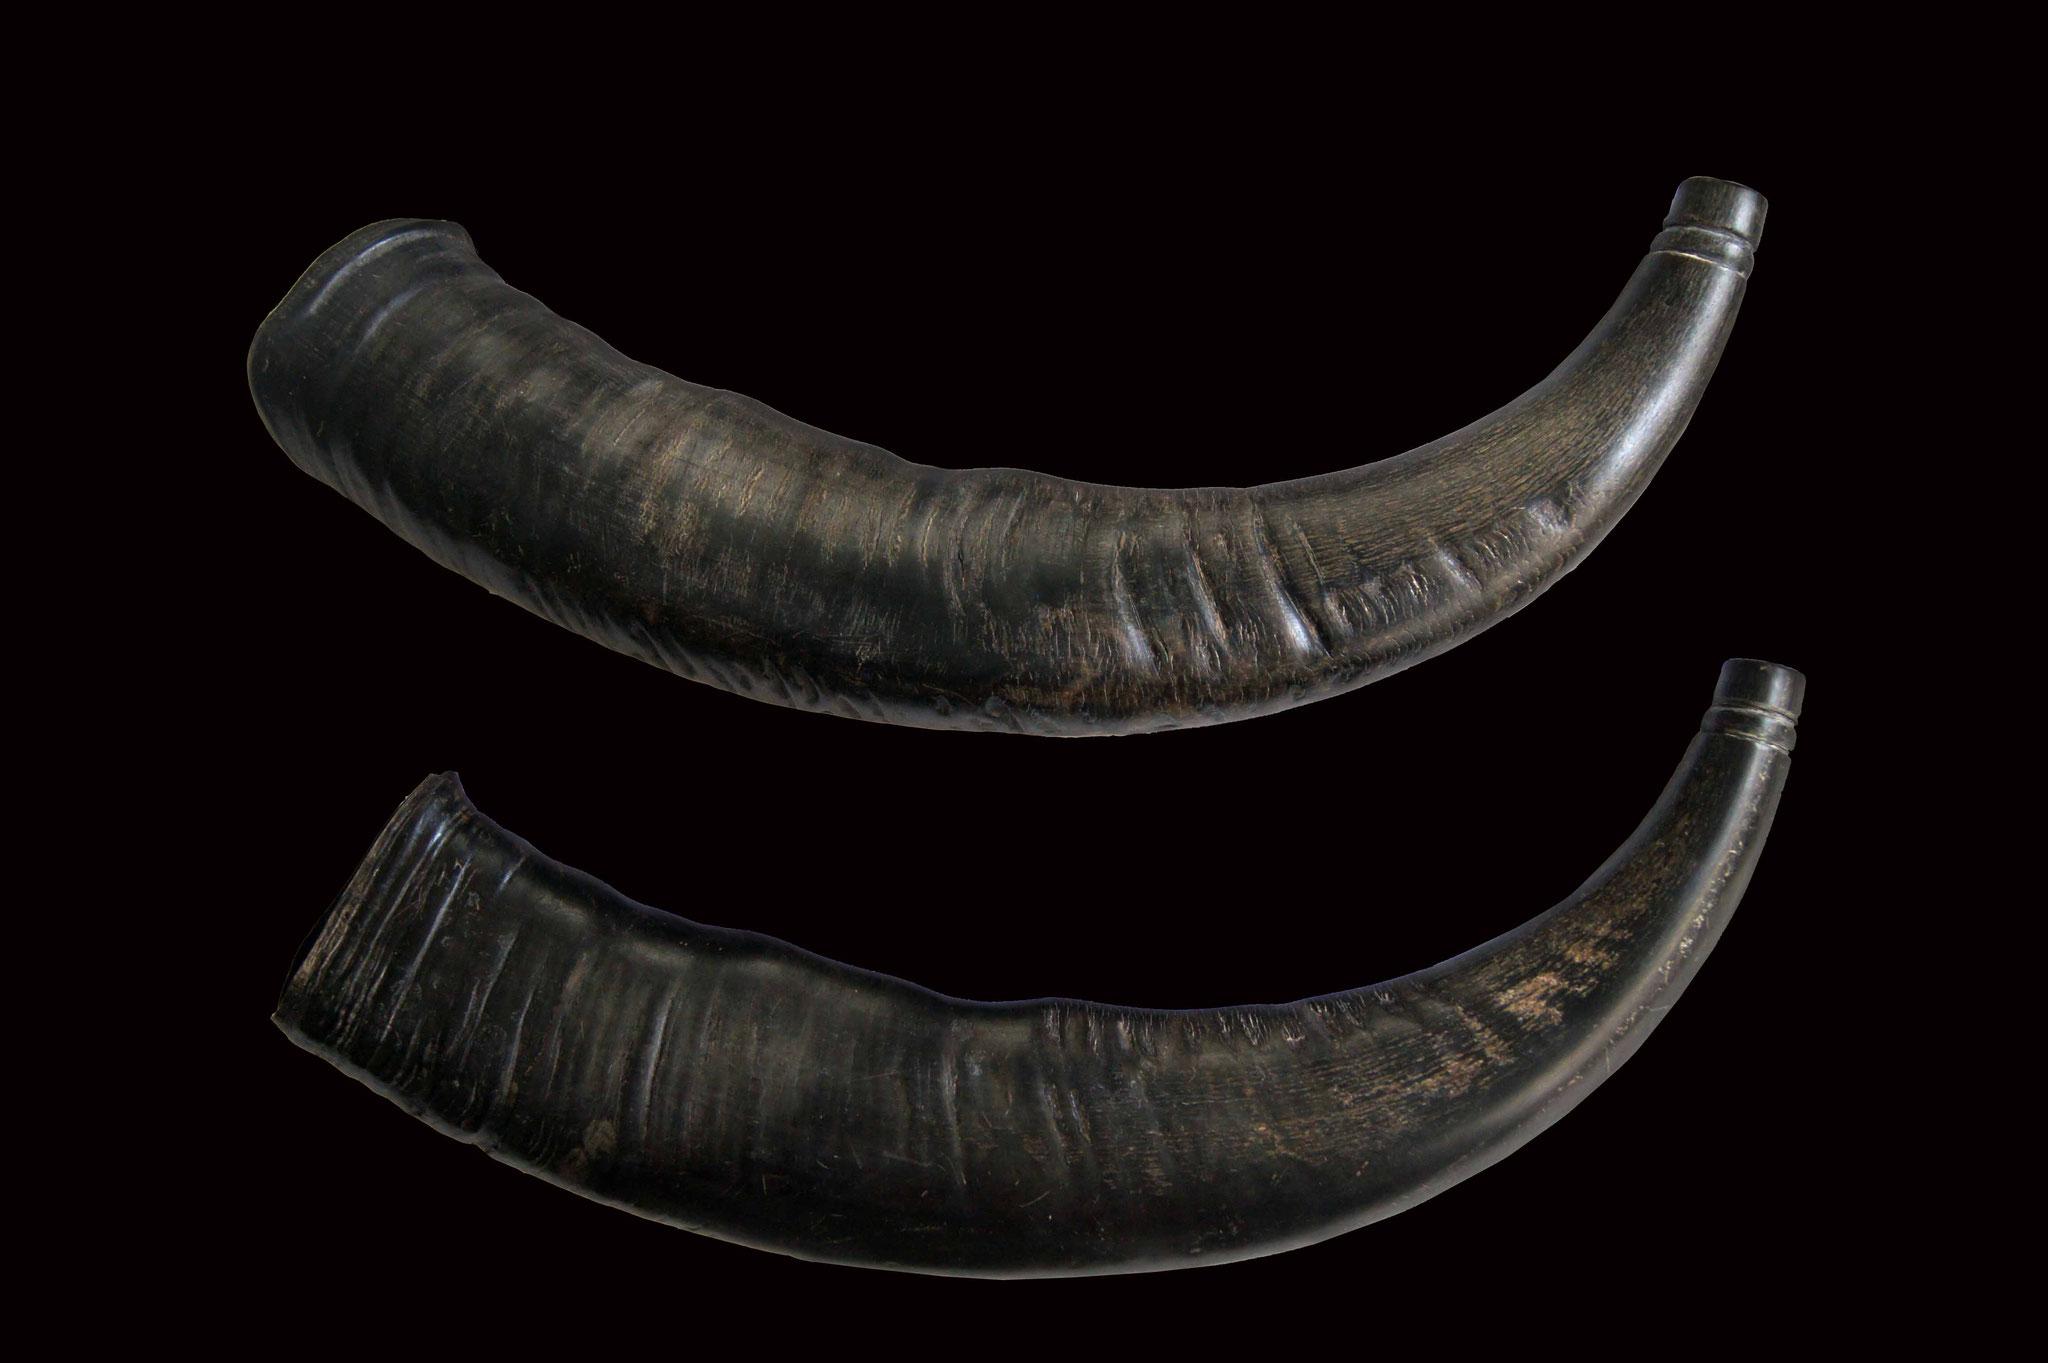 Pair of simple buffalo horns.